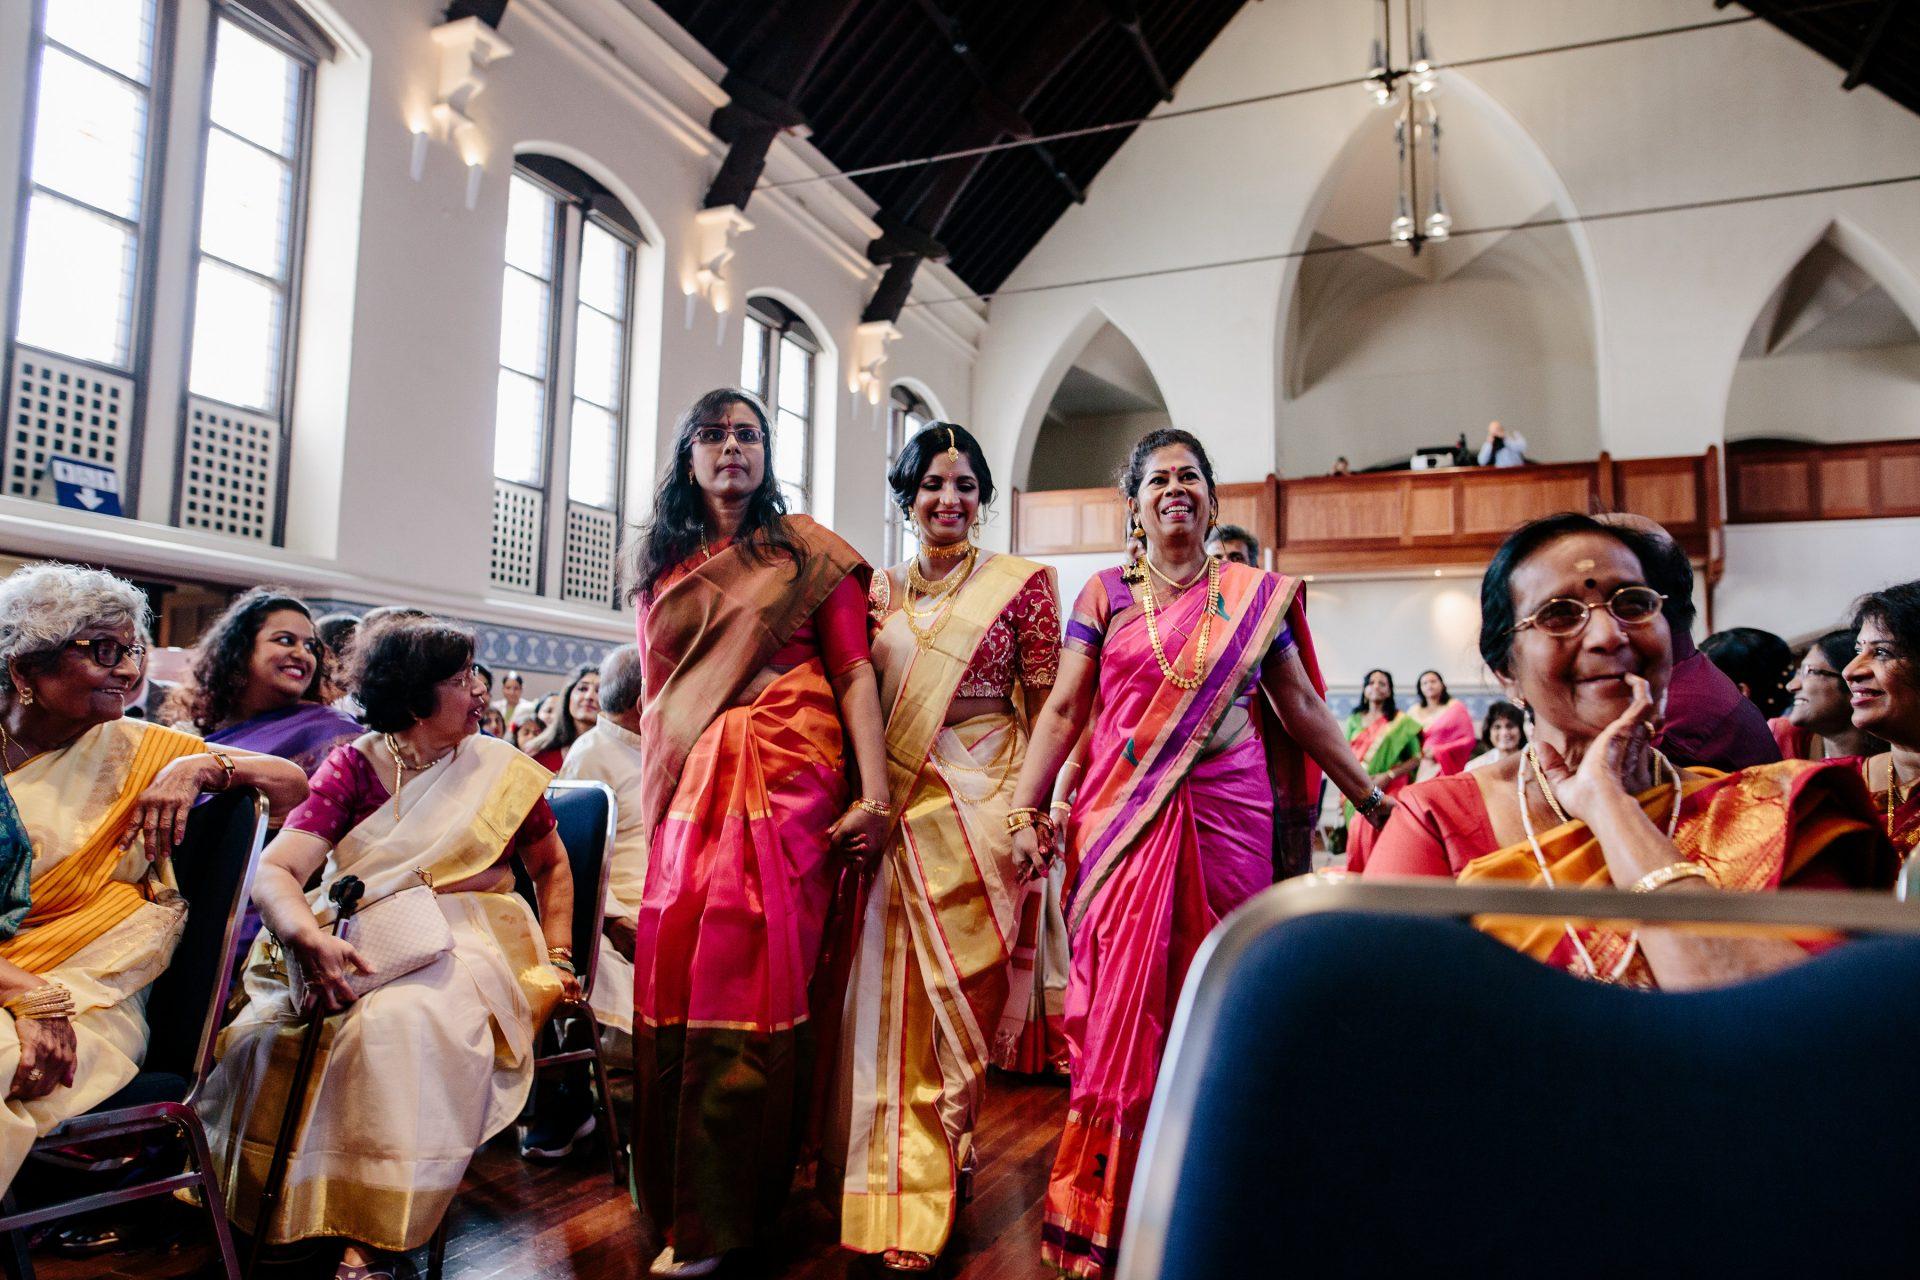 Grant & Rekha Watson's wedding, Perth Town Hall, 2020, Image courtesy of benandebony.com.au